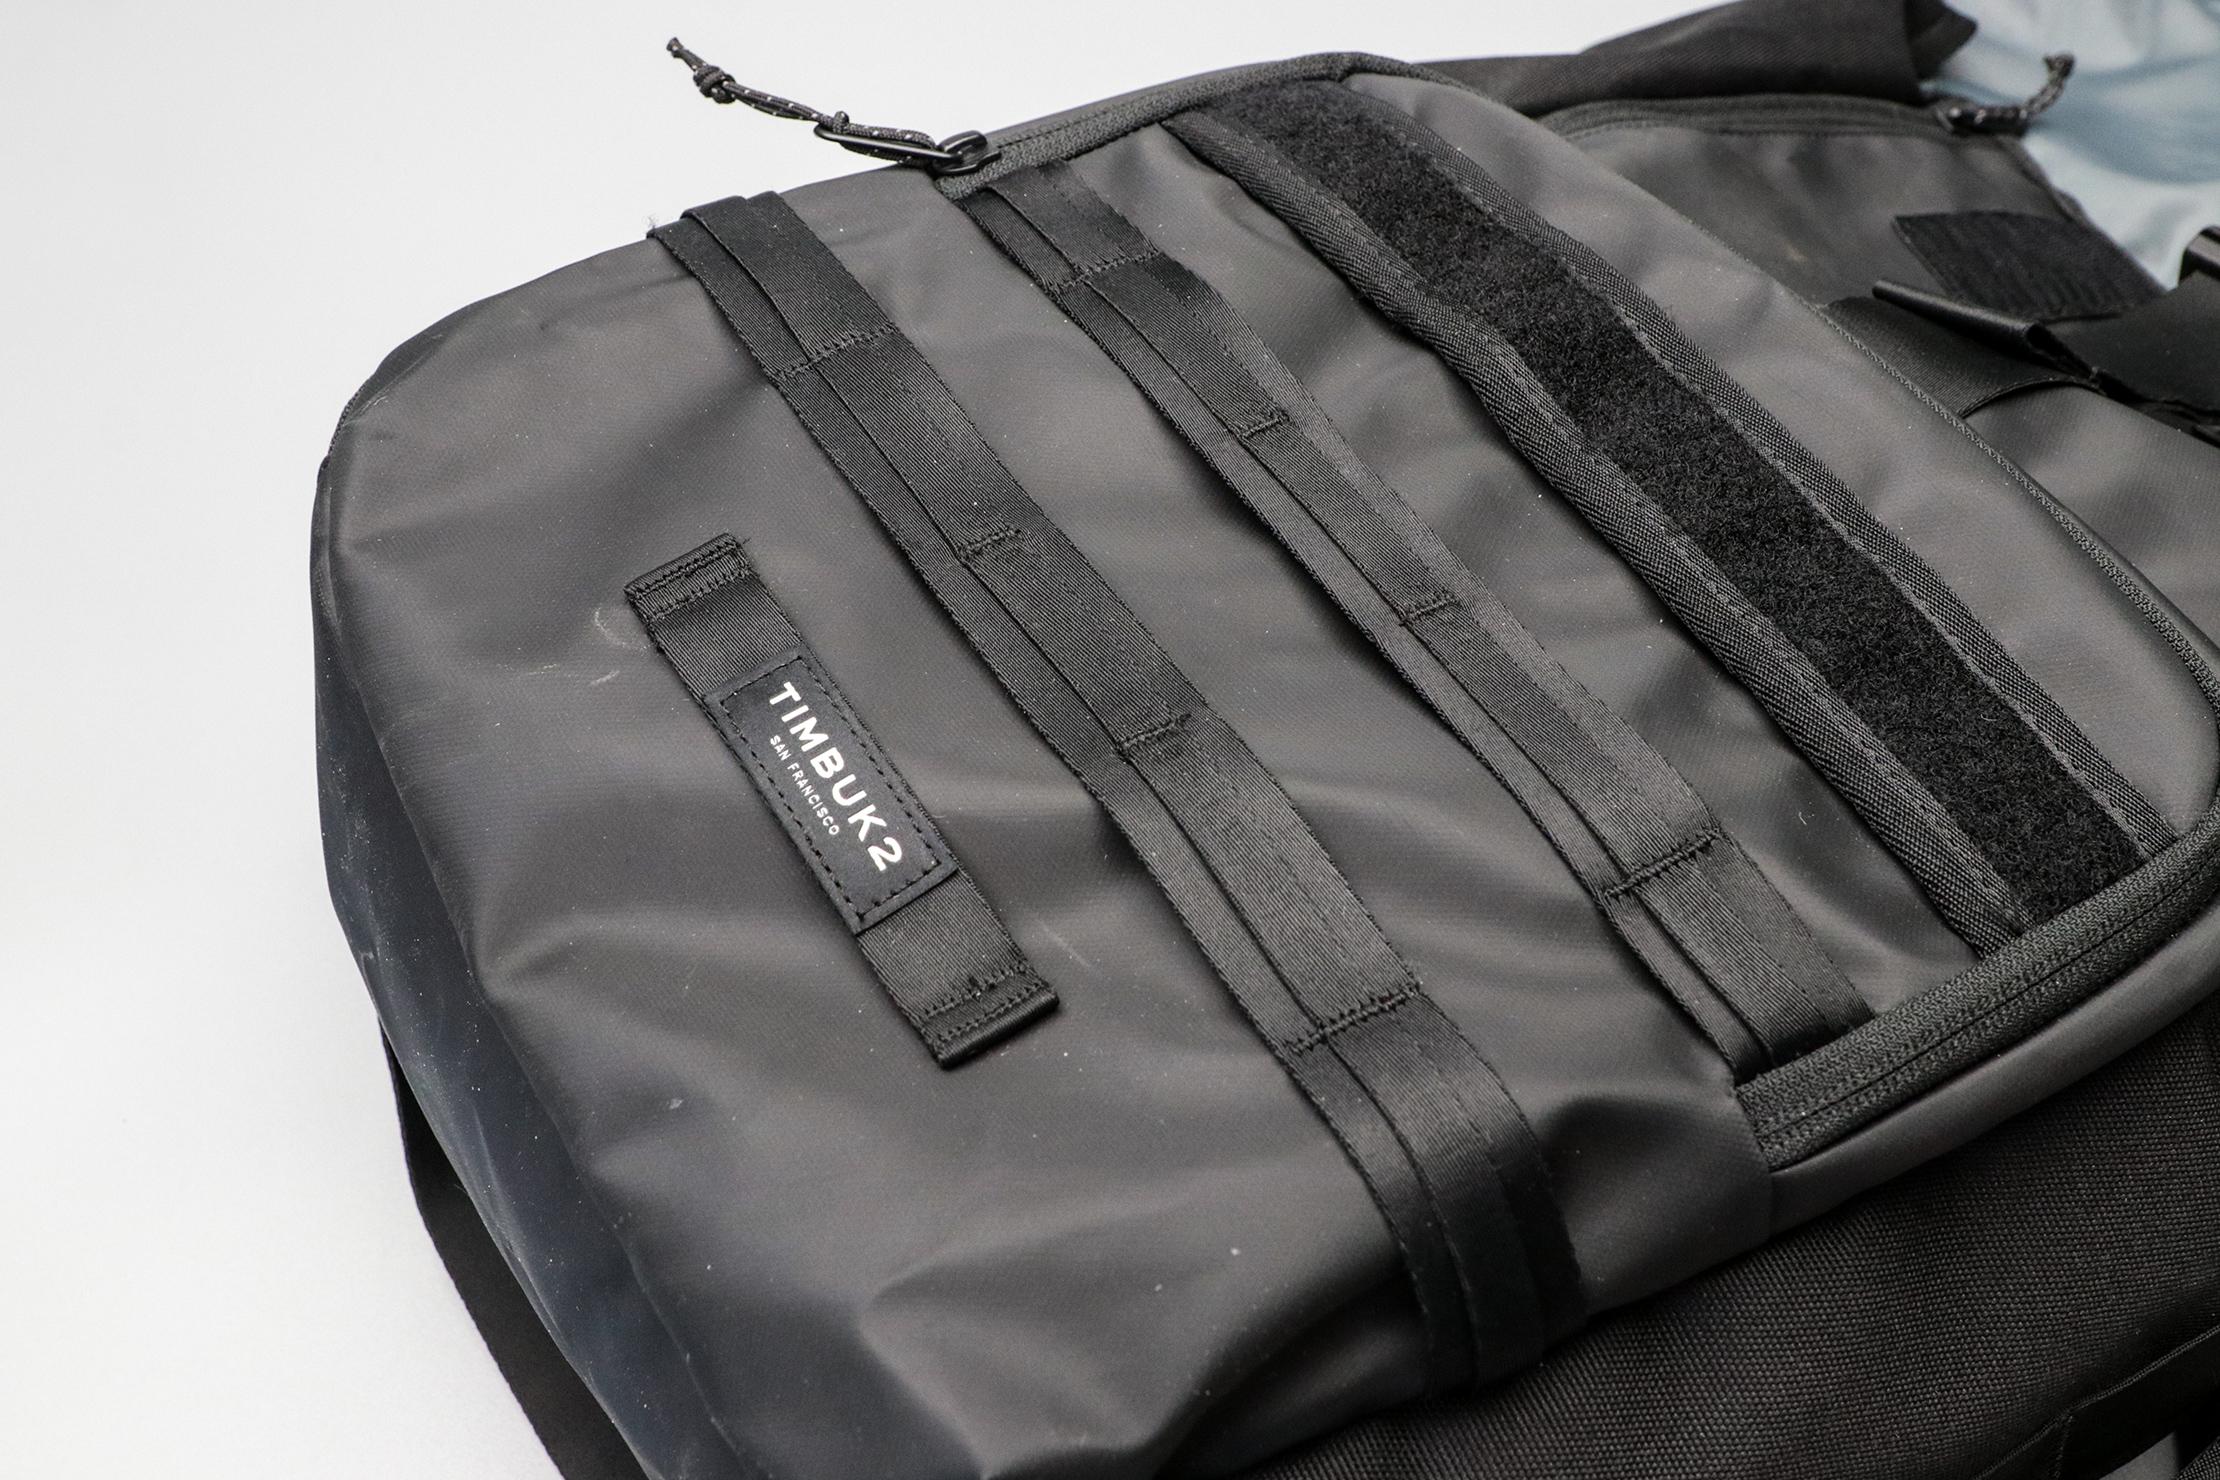 Timbuk2 Spire Laptop Backpack 2.0 webbing